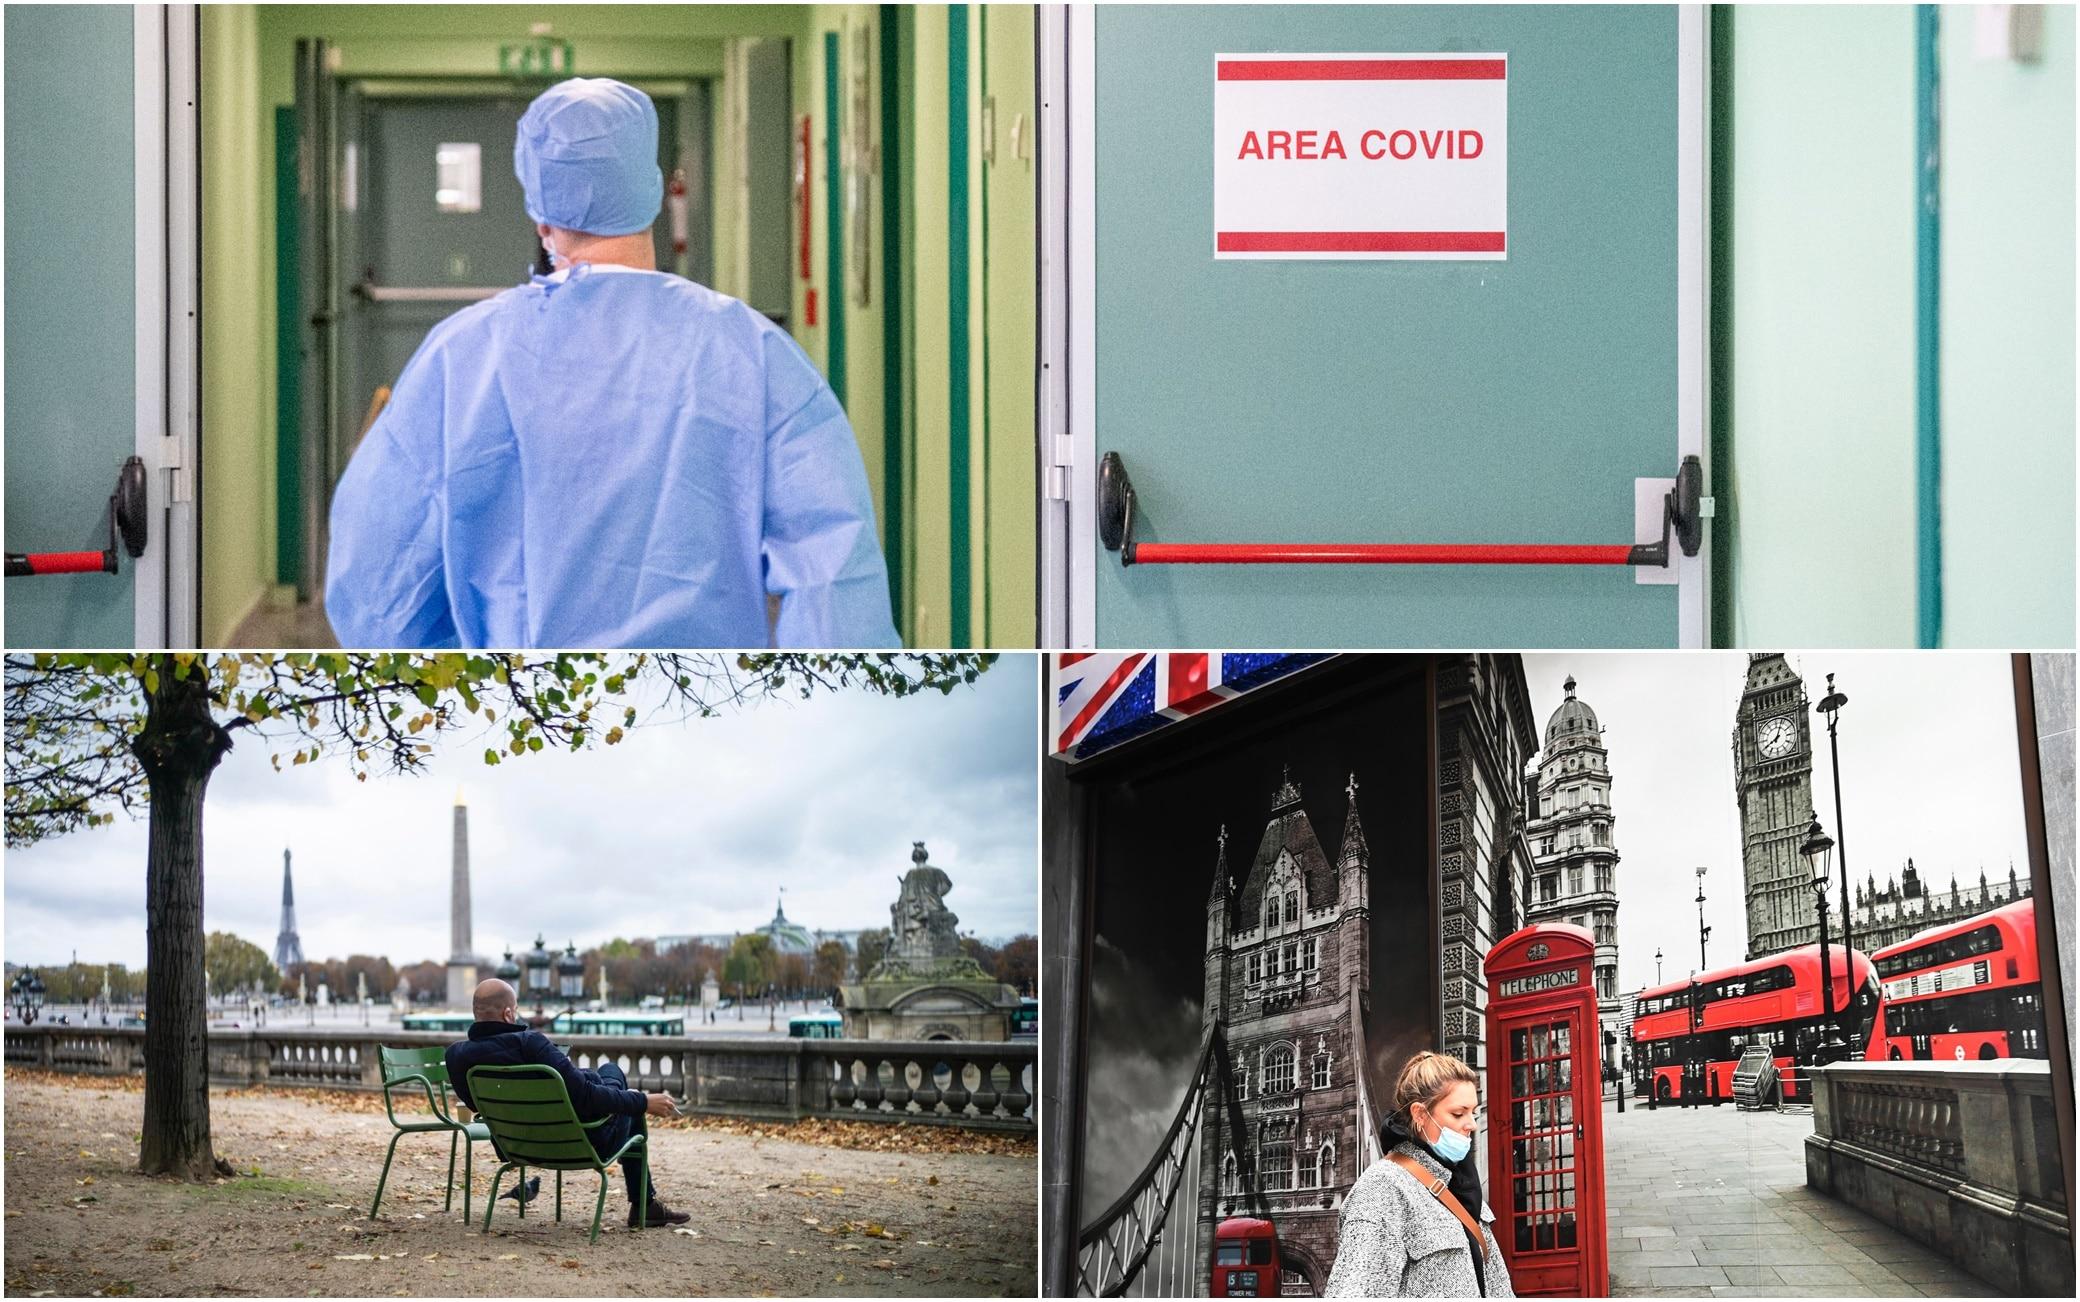 Coronavirus mondo, 10 Paesi con più casi in 24h: 6 europei, c'è Italia